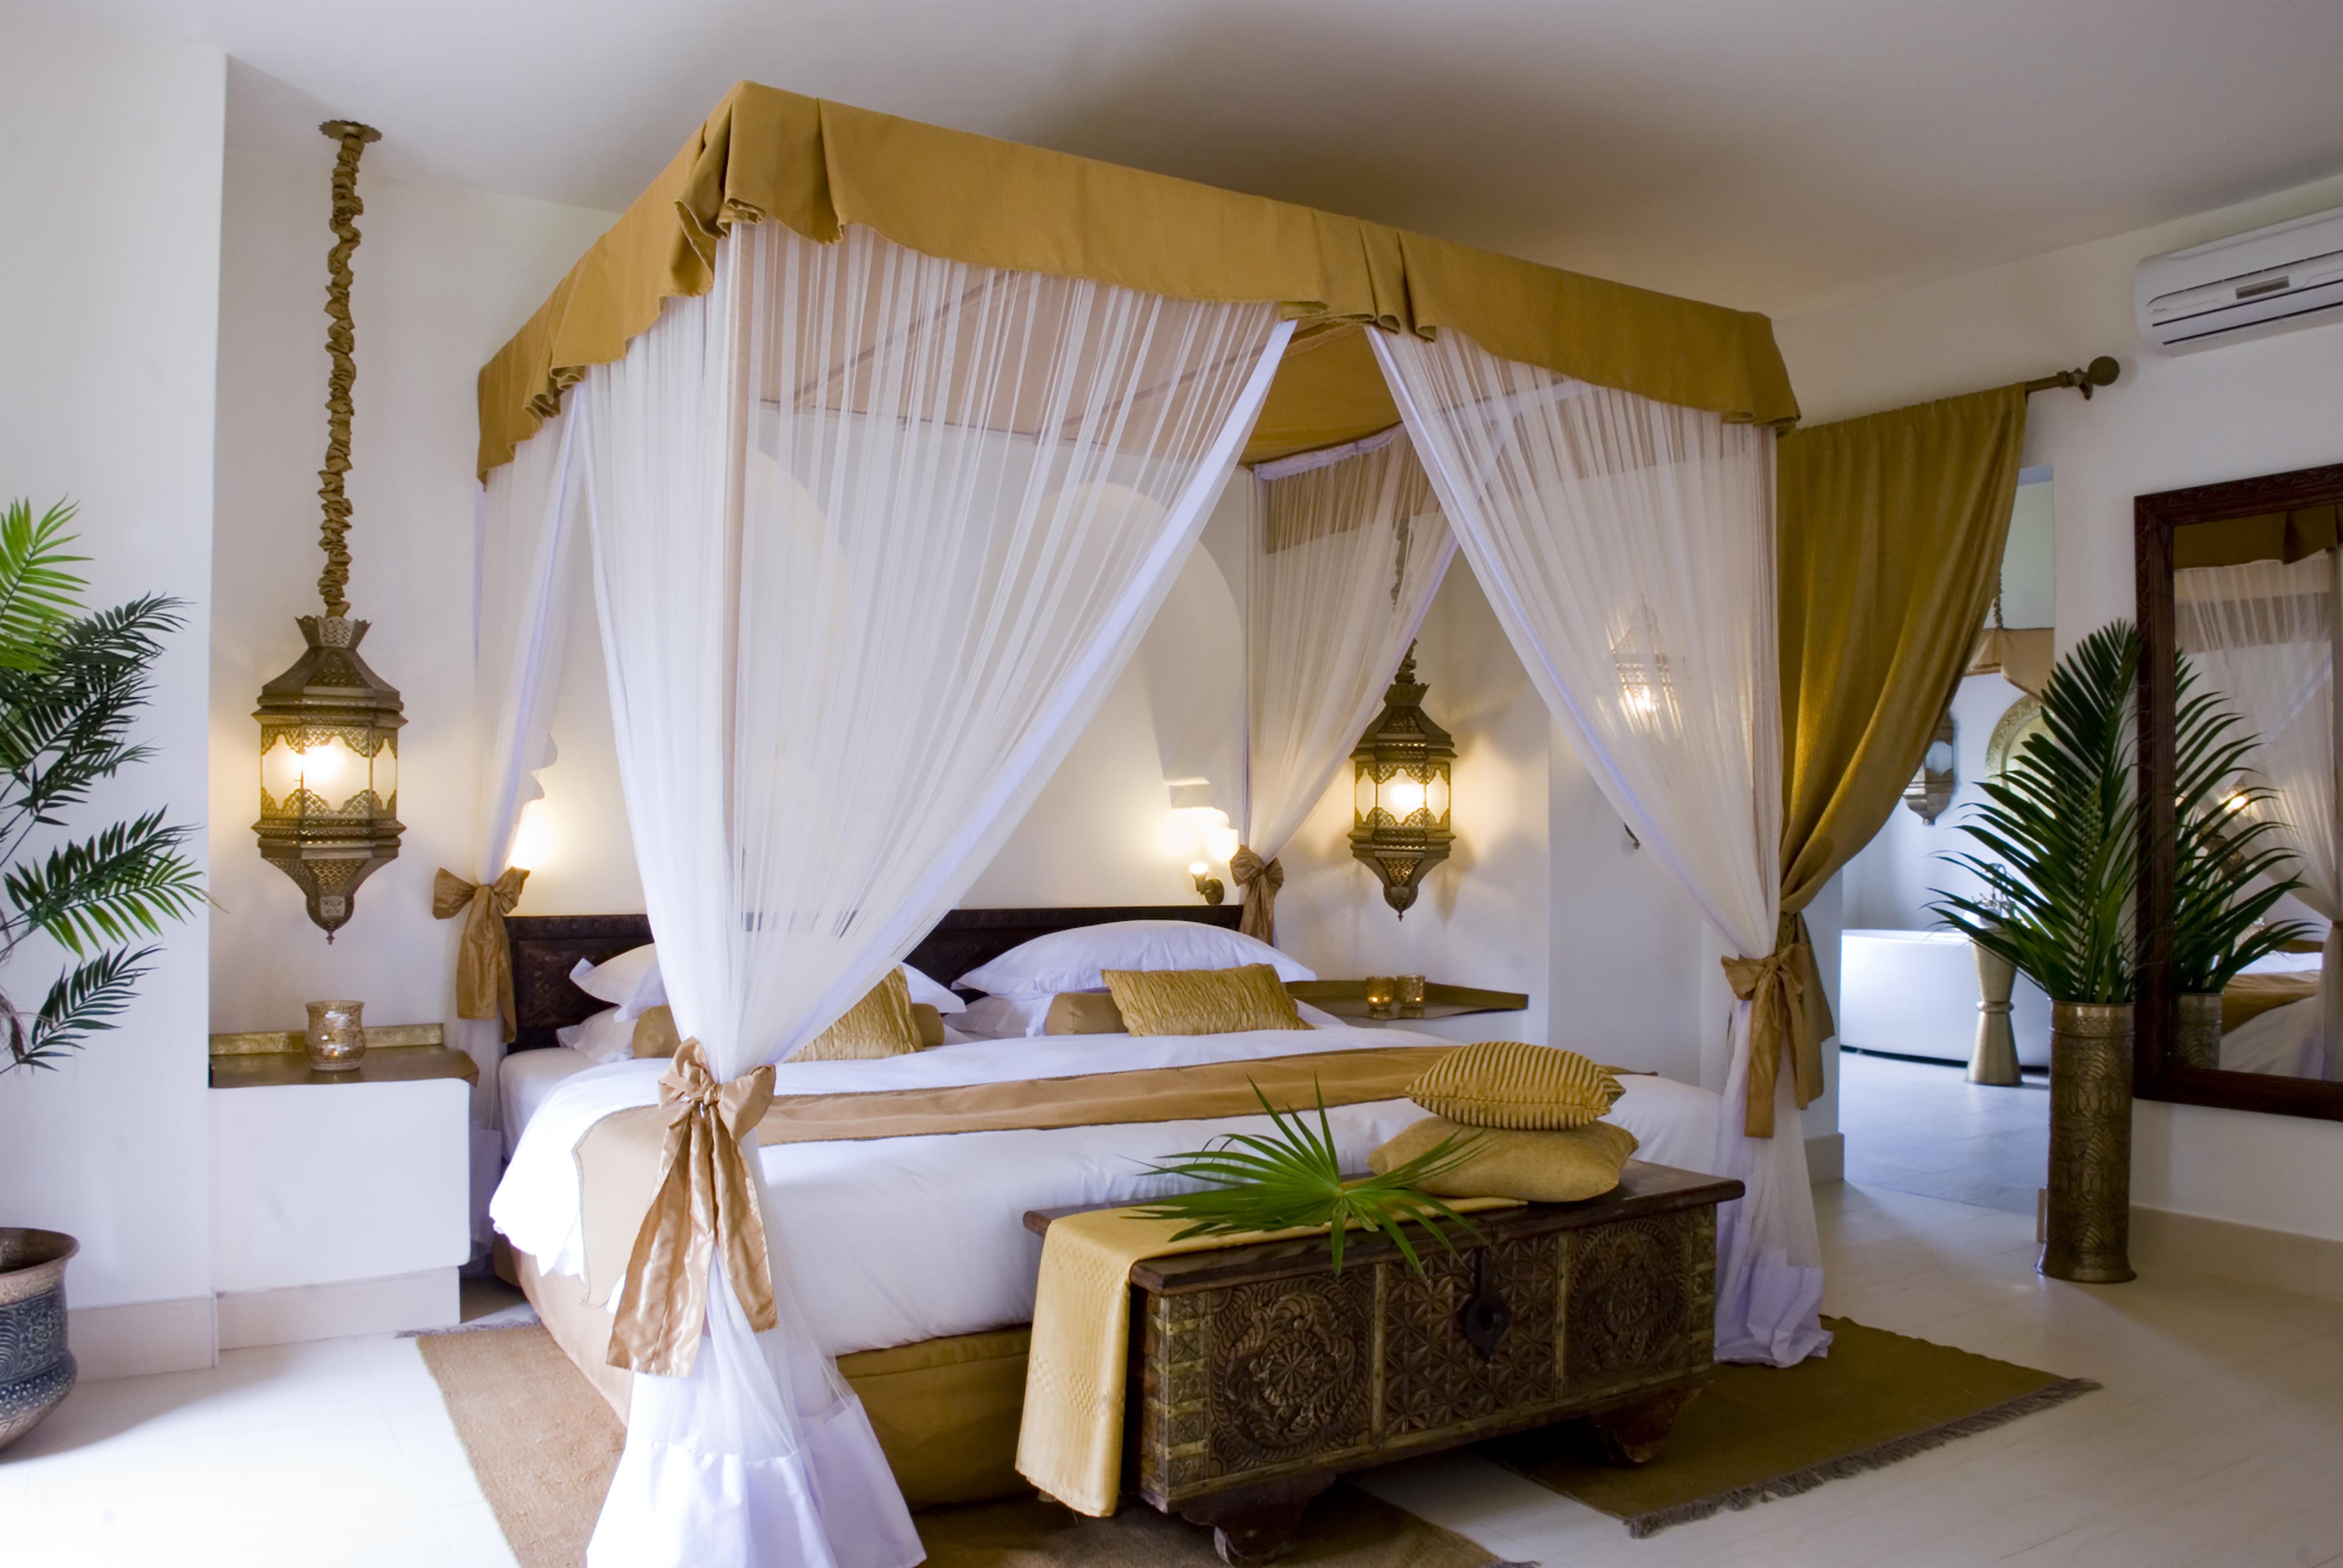 Baraza-luxury-villa-bedroom